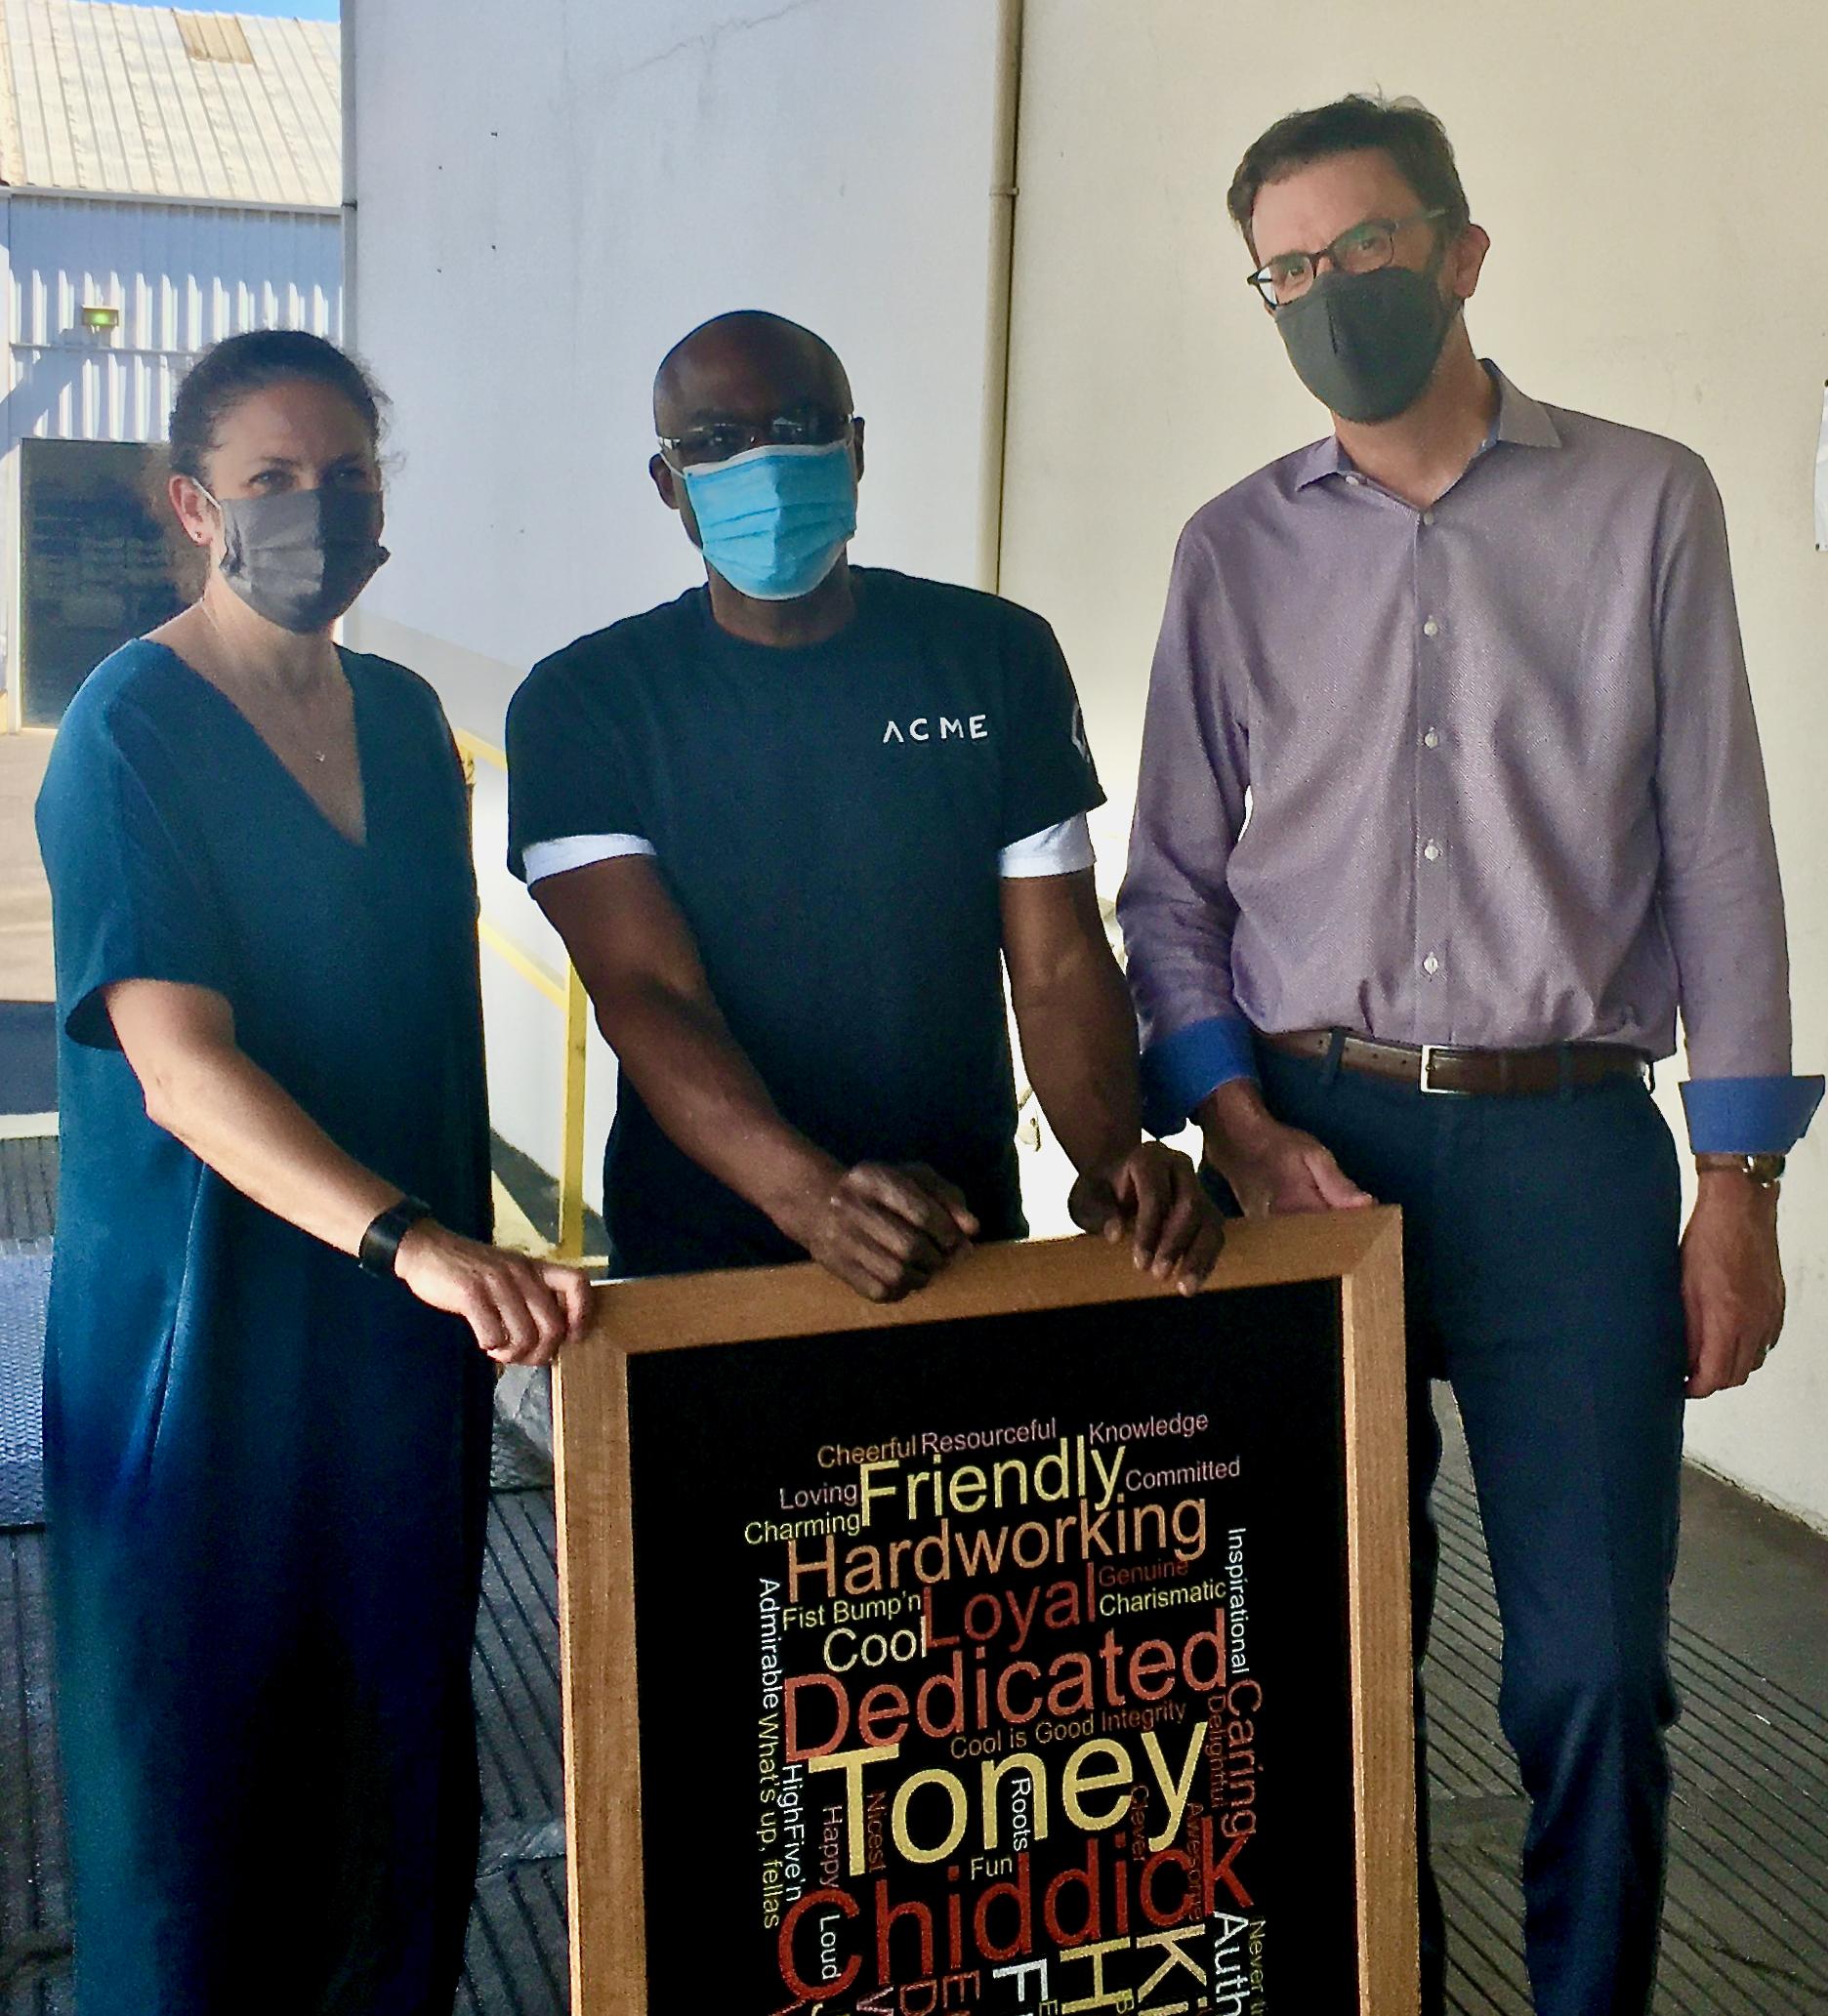 Toney Chiddick Celebration | Toney with Owners | Portland, OR